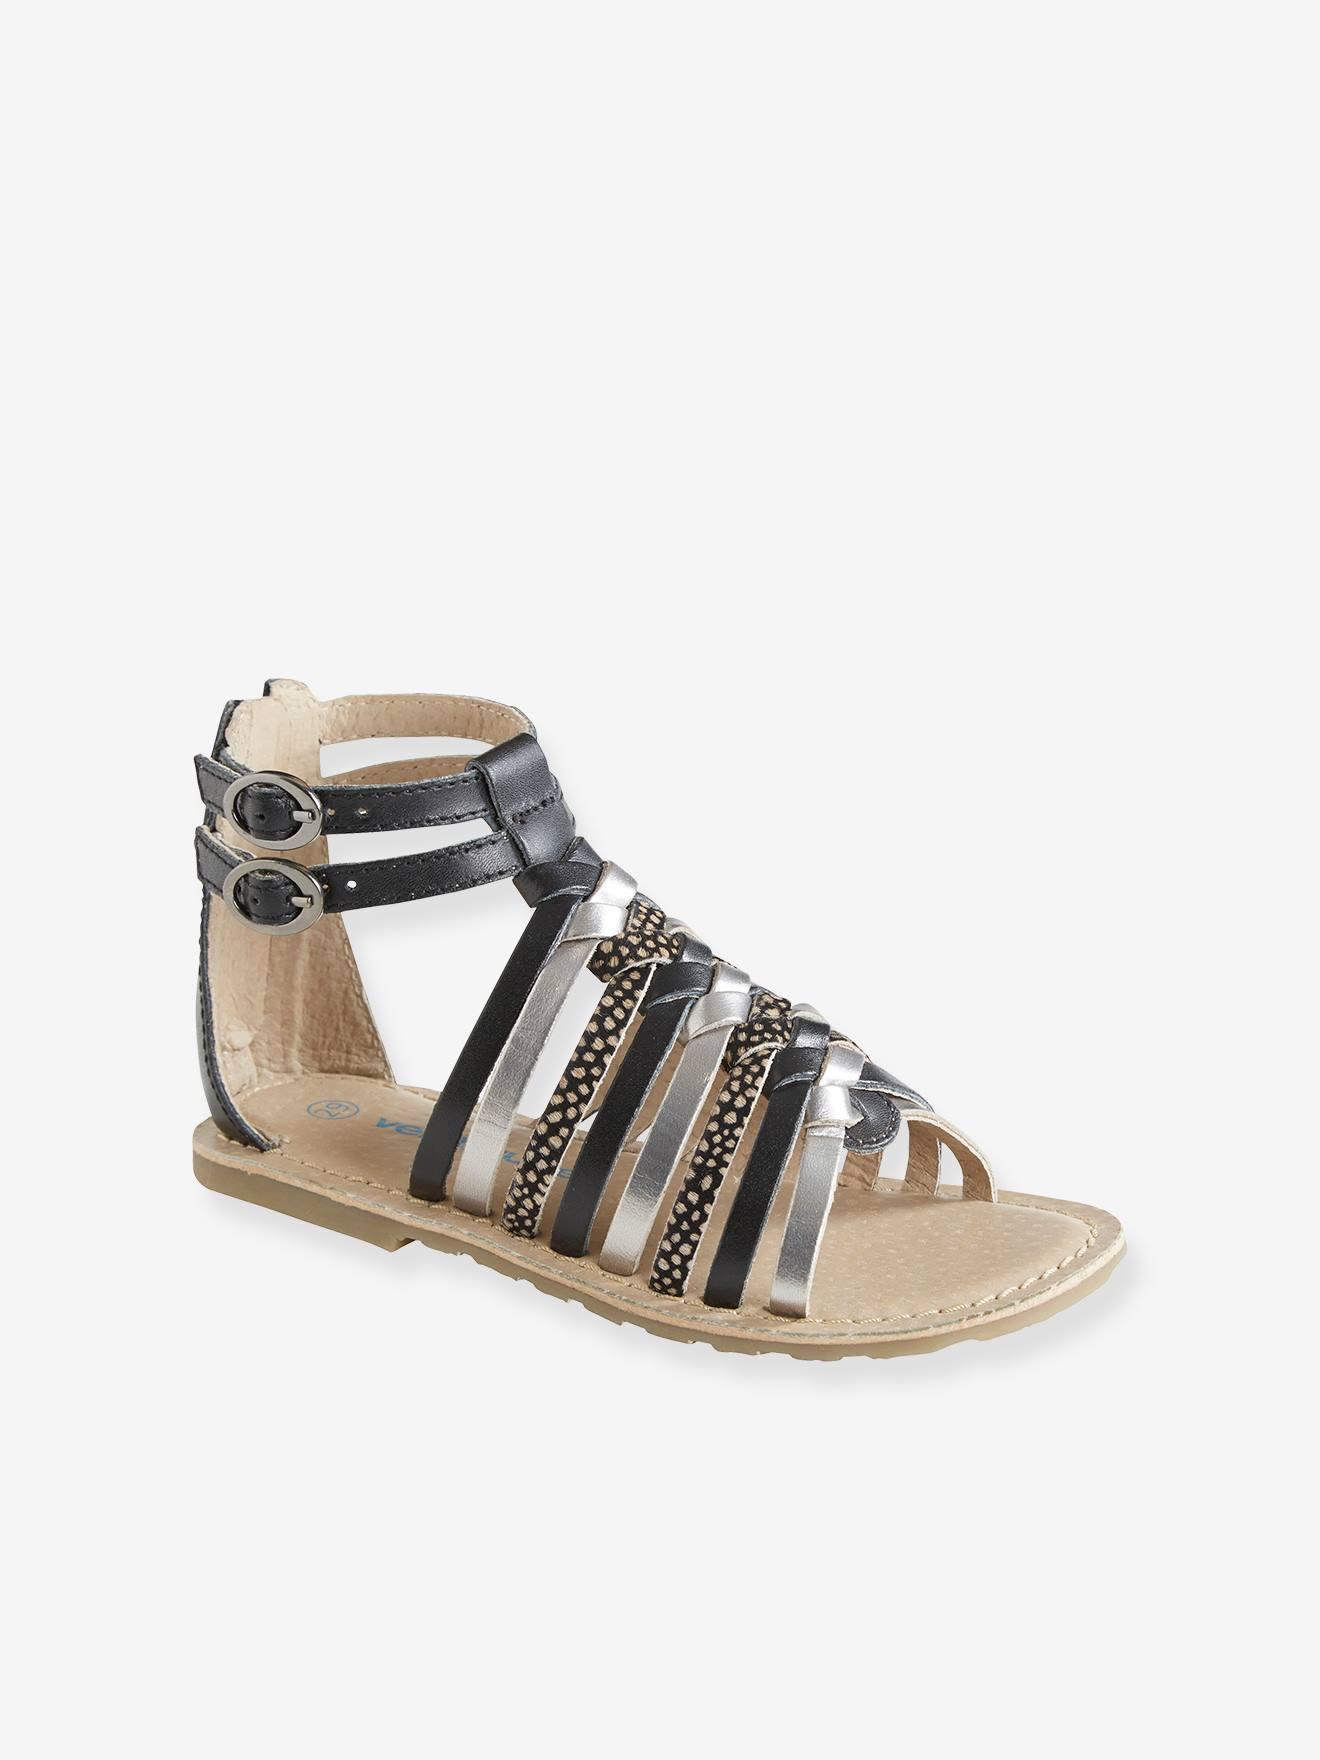 Sandálias em pele, para menina Calçado Vertbaudet   vertbaudet.pt